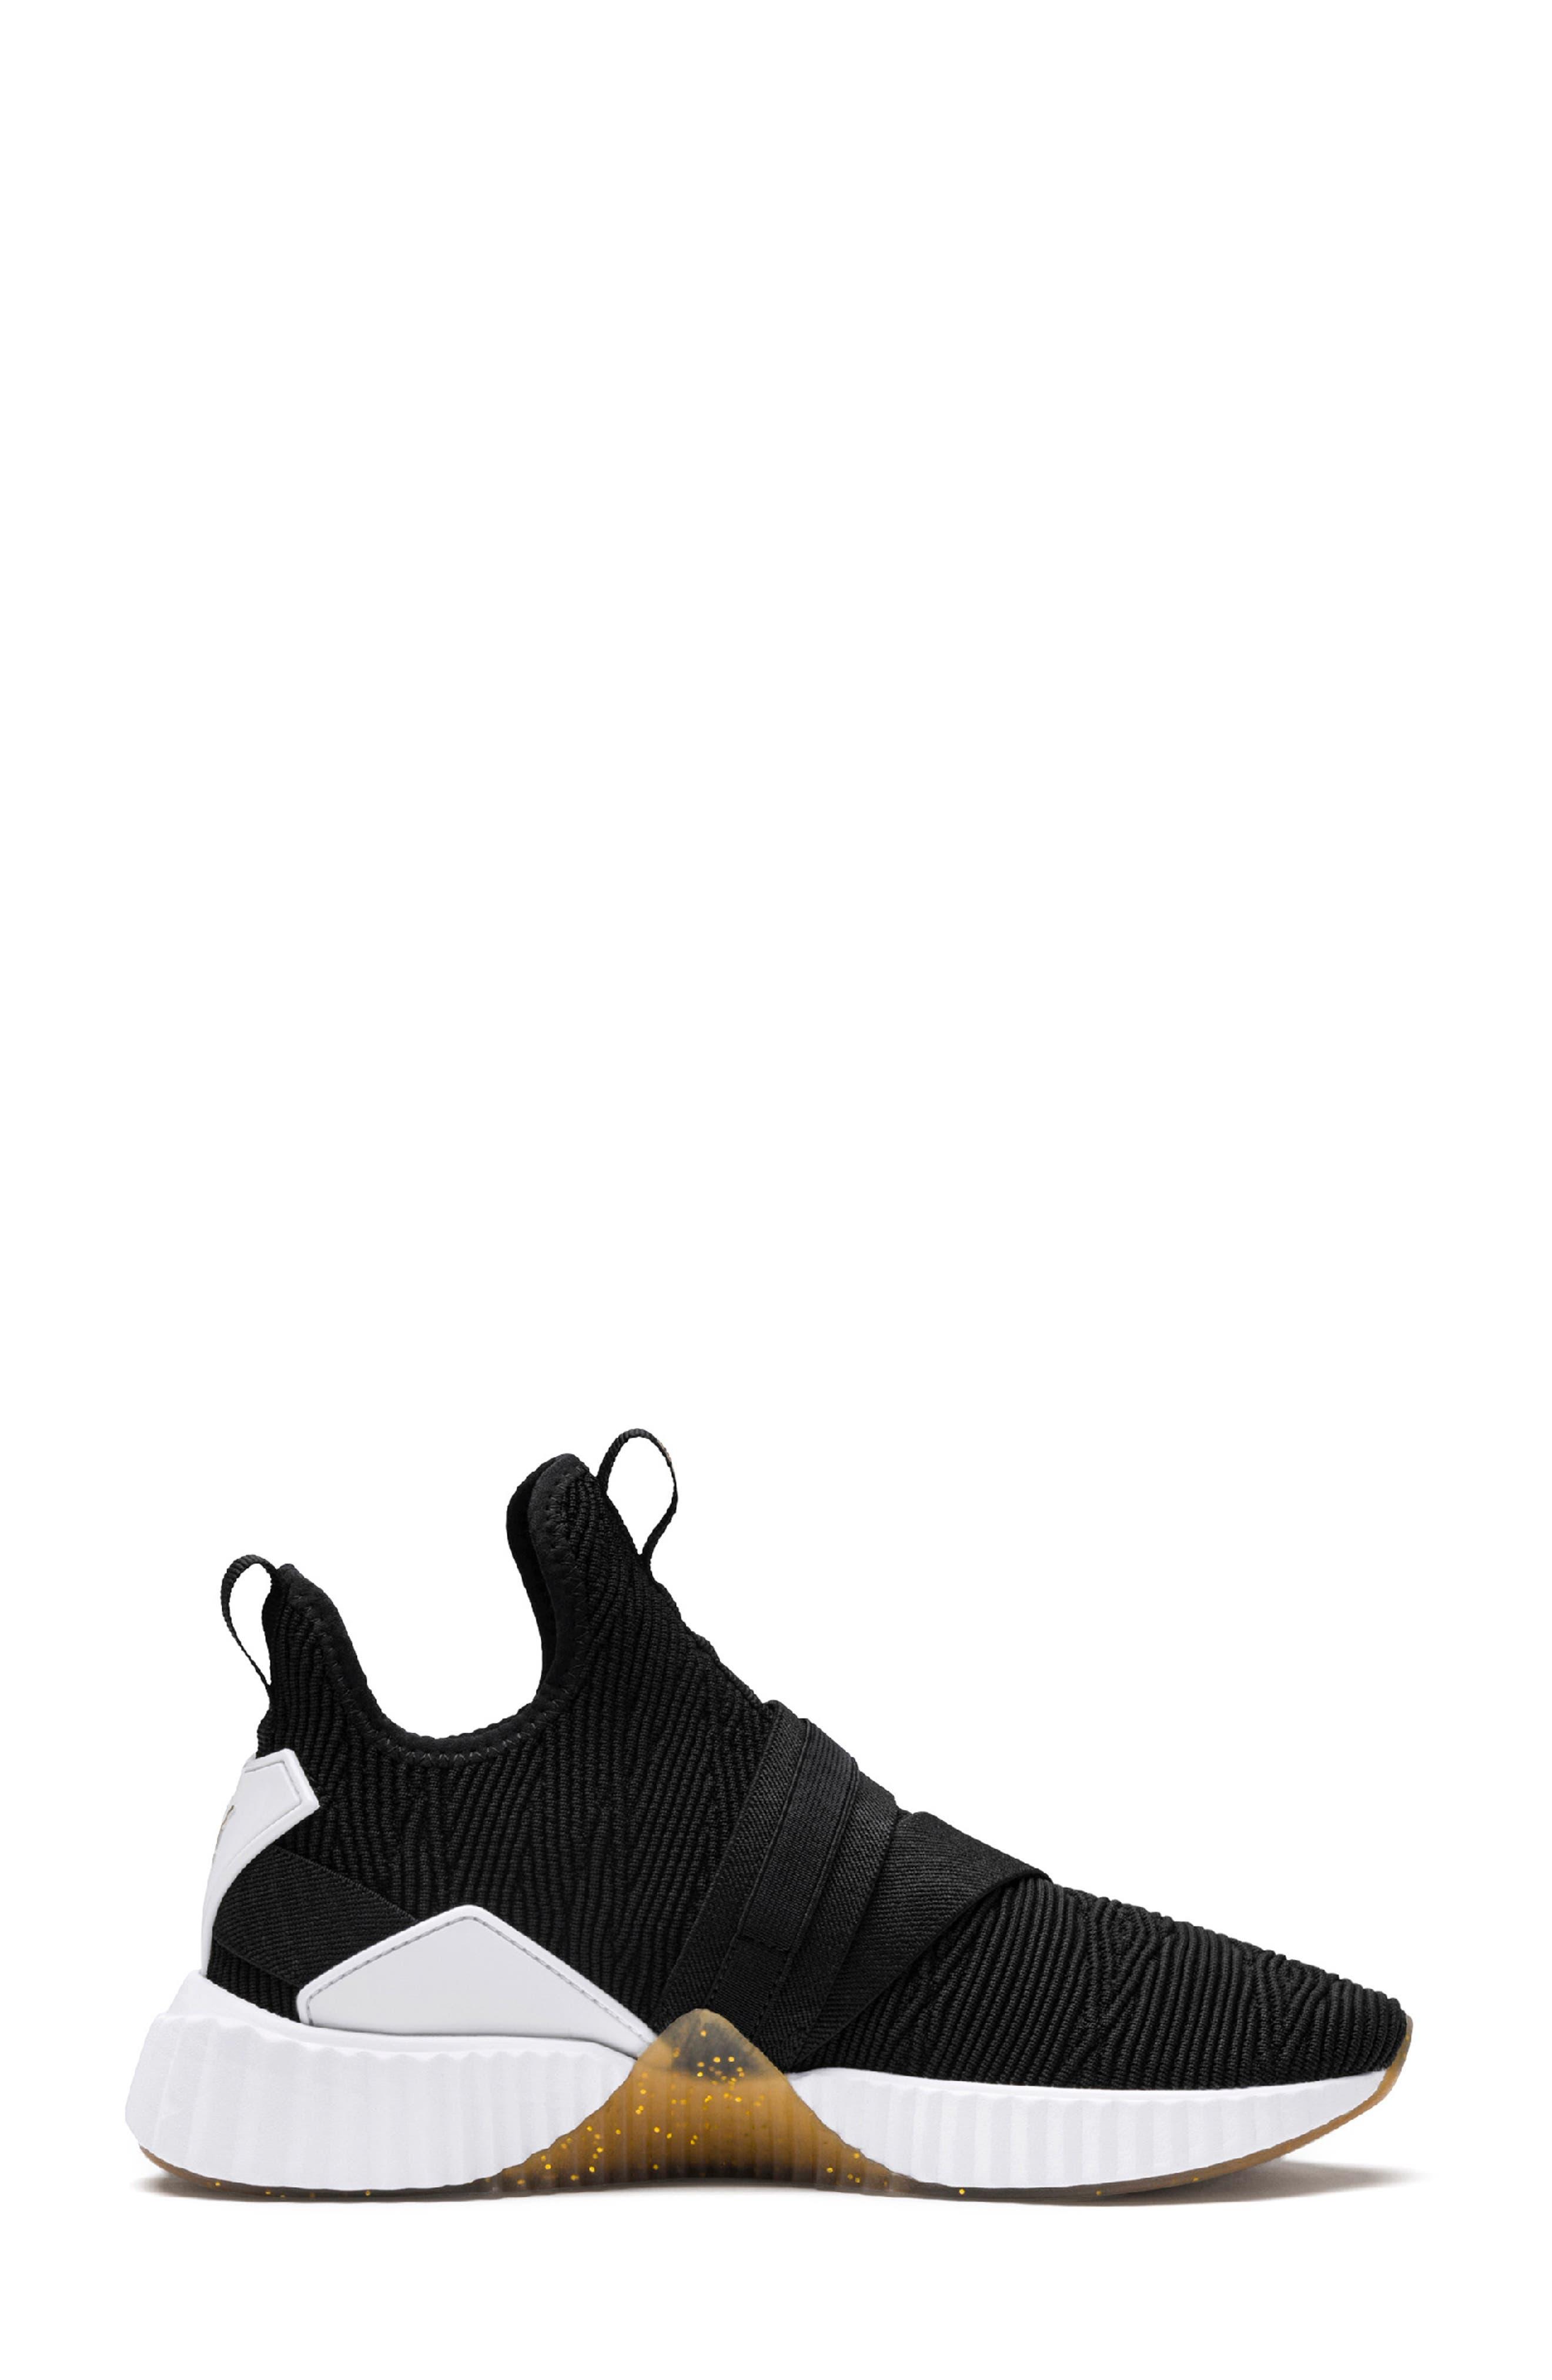 Defy Mid Varsity Sneaker,                             Alternate thumbnail 3, color,                             PUMA BLACK/ METALLIC GOLD